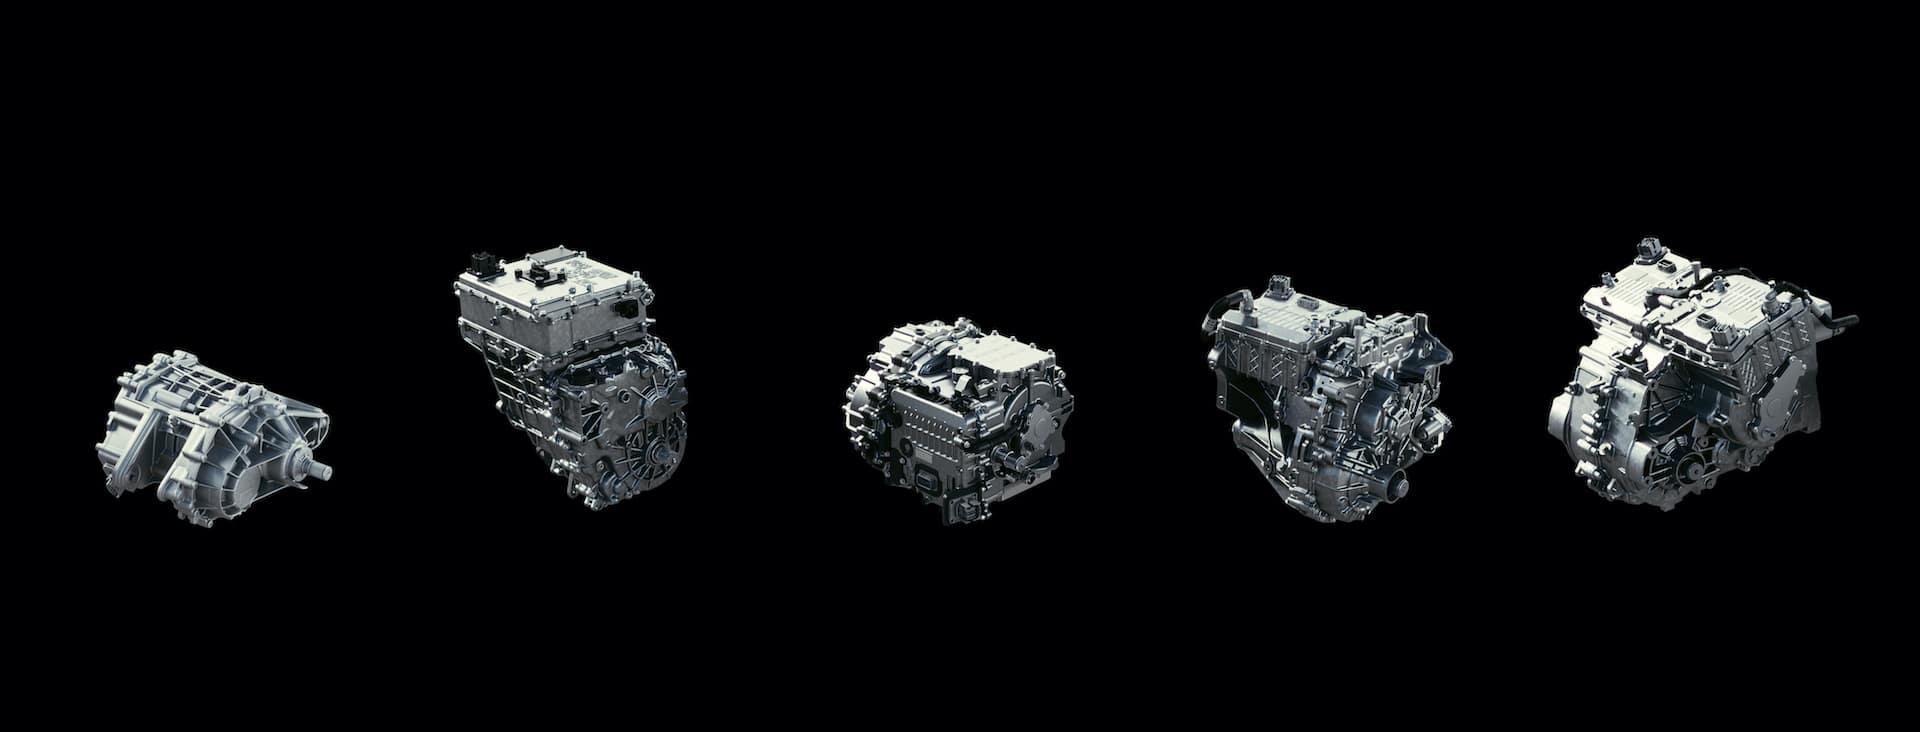 Ultium Drive GM Elektroauto-Motor